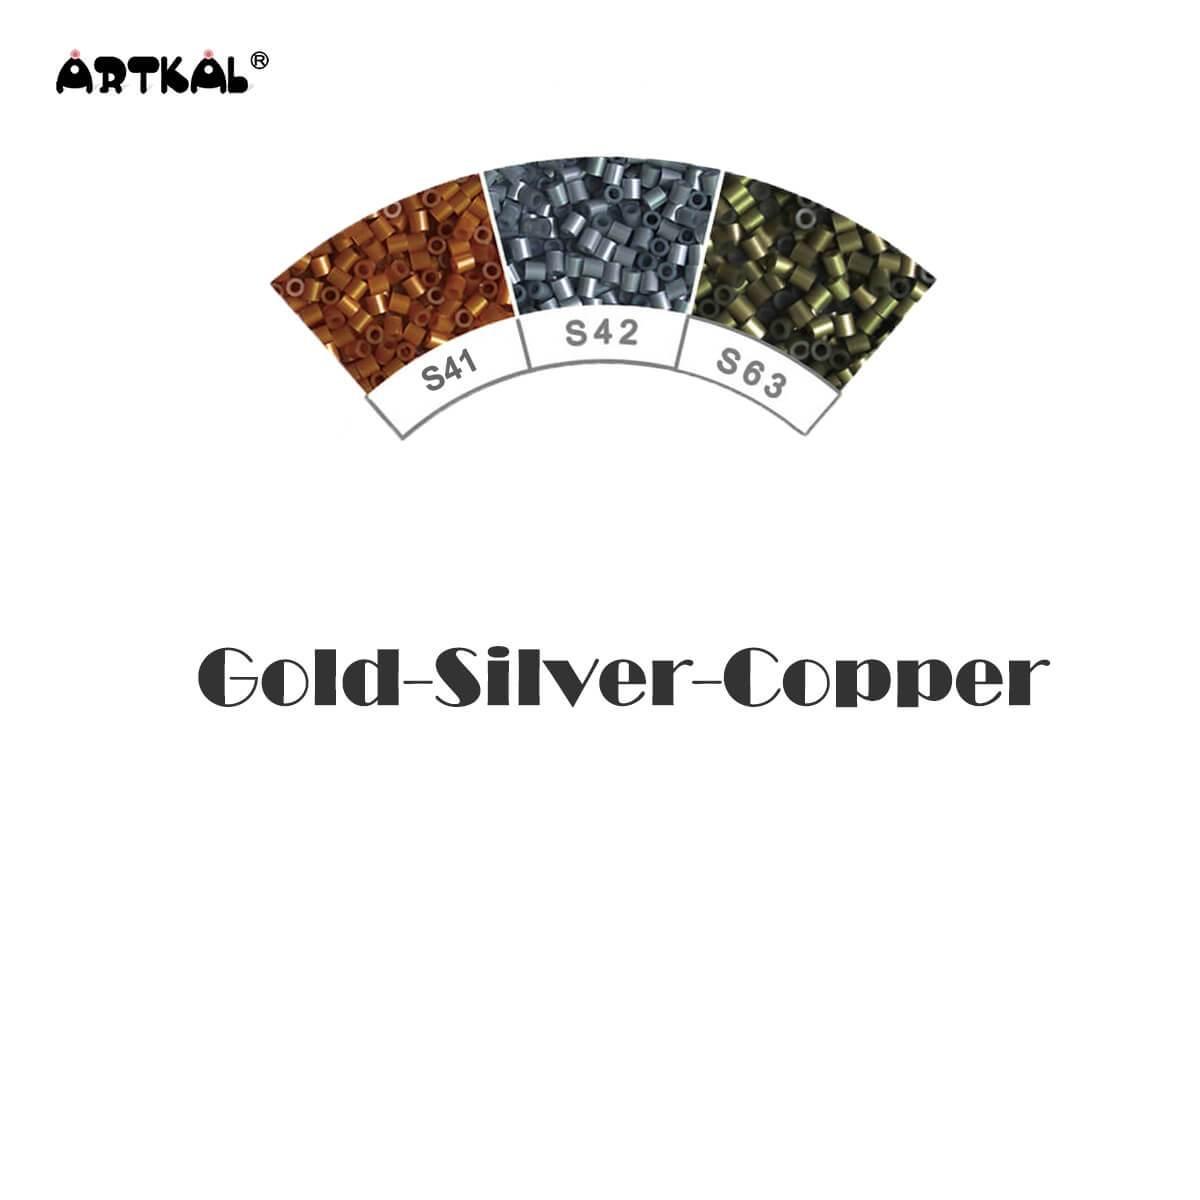 17-artkal-beads-s-5mm-gold-silver-copper-2000x.jpg